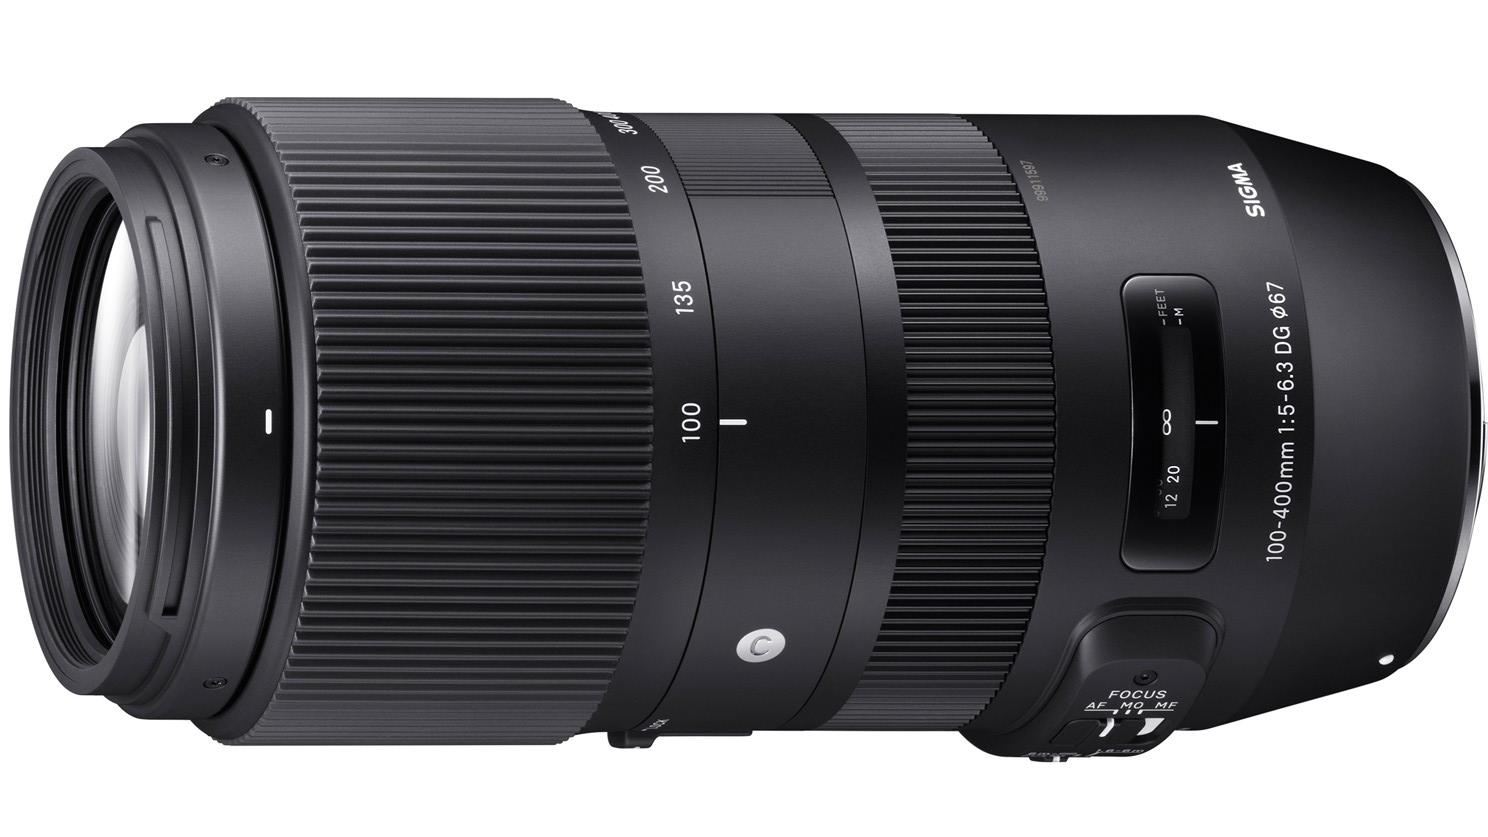 Sigma 100-400mm f/5-6.3 DG HSM OS